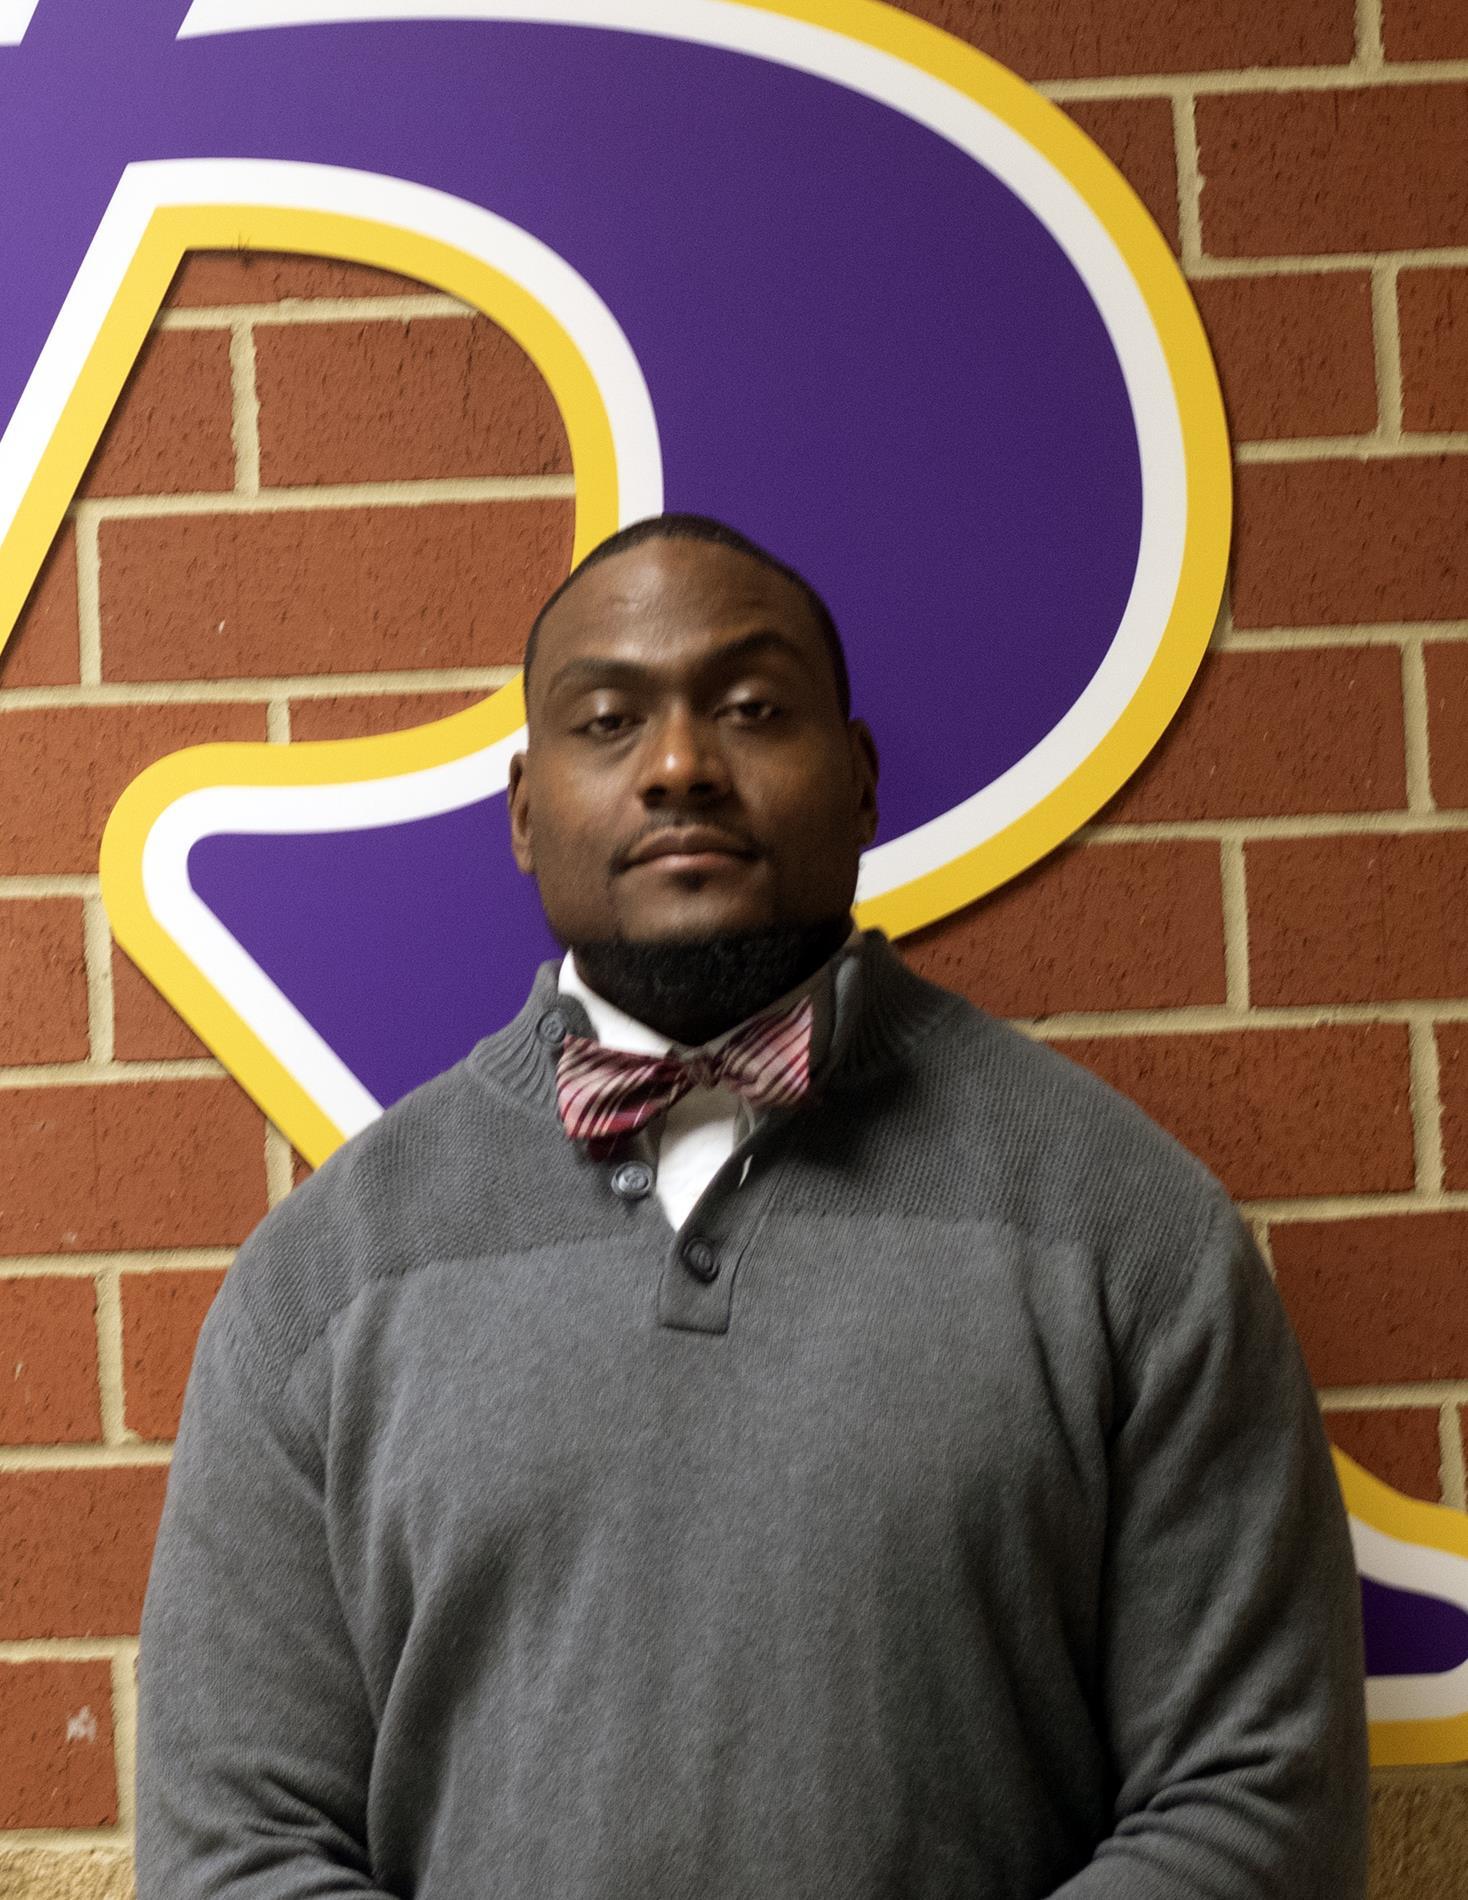 Charrod Taylor, Assistant Principal